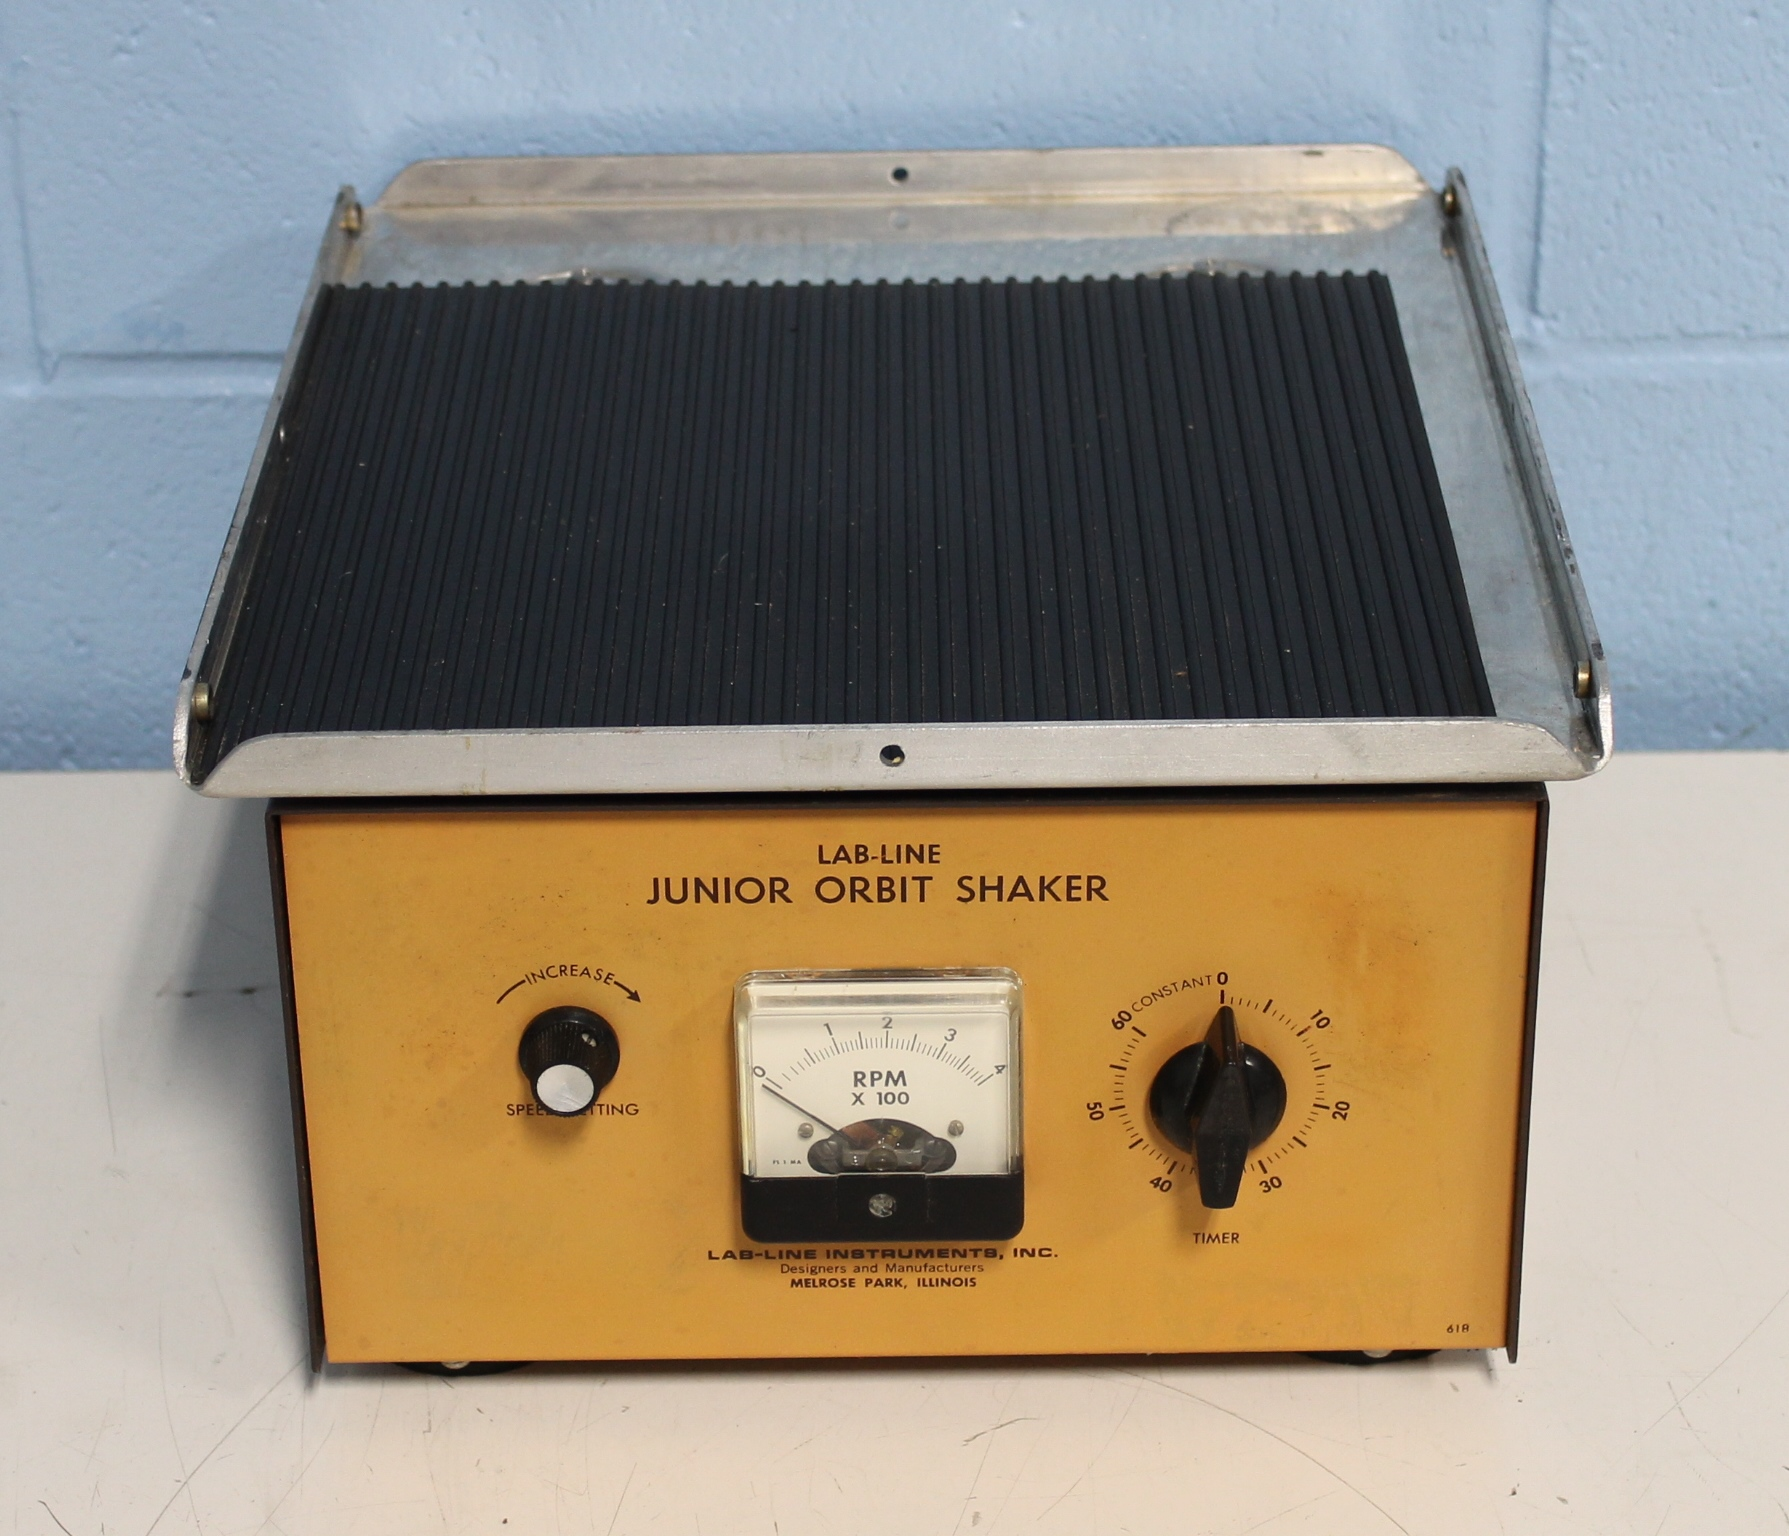 Lab Line Instruments Model 3520 Orbit Shaker Image